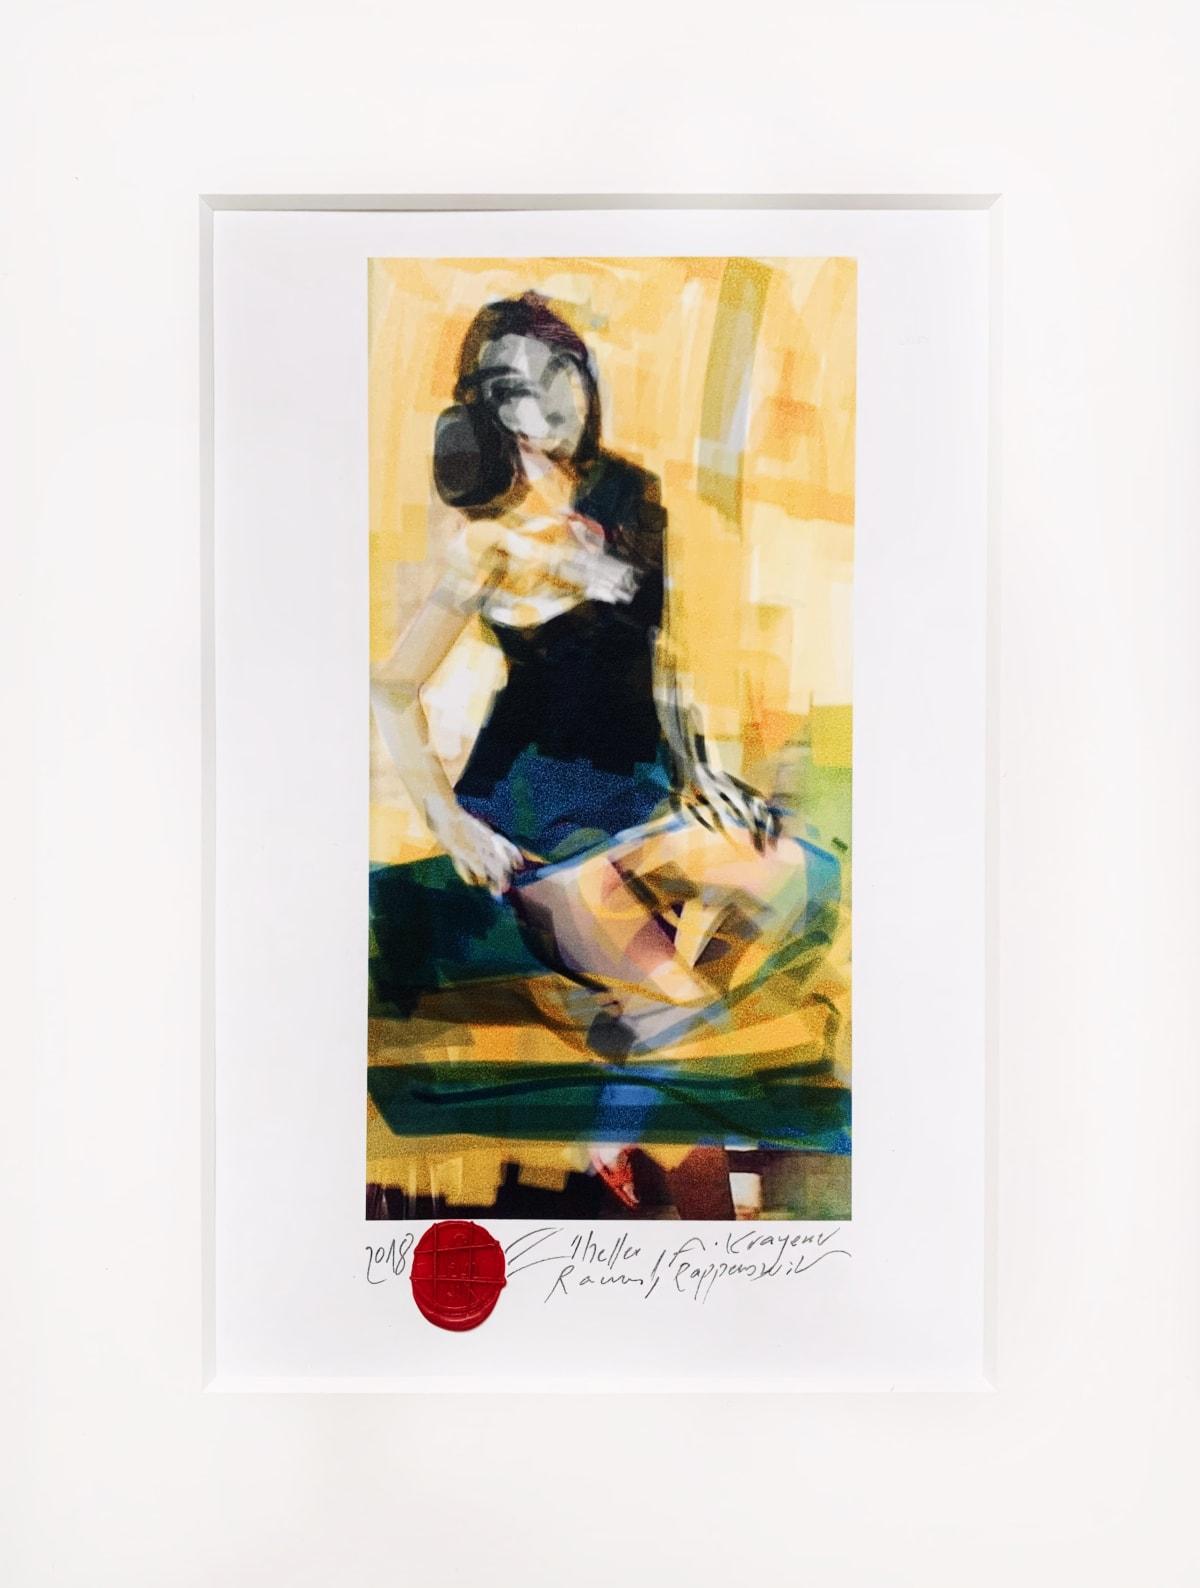 Krayem Maria Awad Heller Raum, 2018 Digital Art, Glicee Print on UV Coated Paper Piece Unique 30 x 20 cm (Framed) 12 x 8 in (Framed)